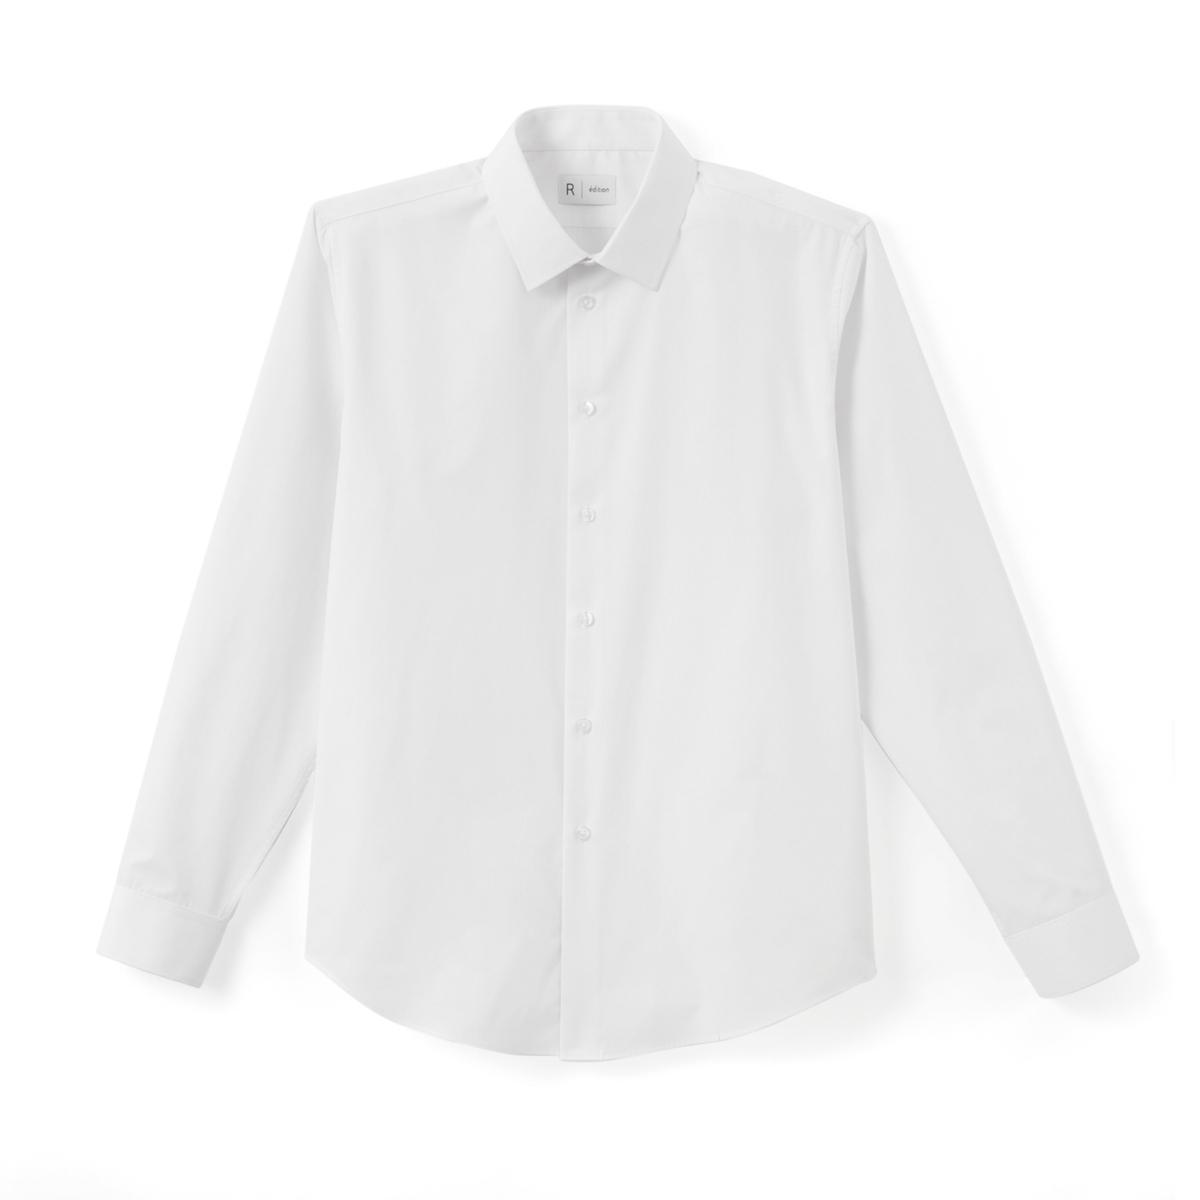 Рубашка La Redoute Collections 47495 от LaRedoute